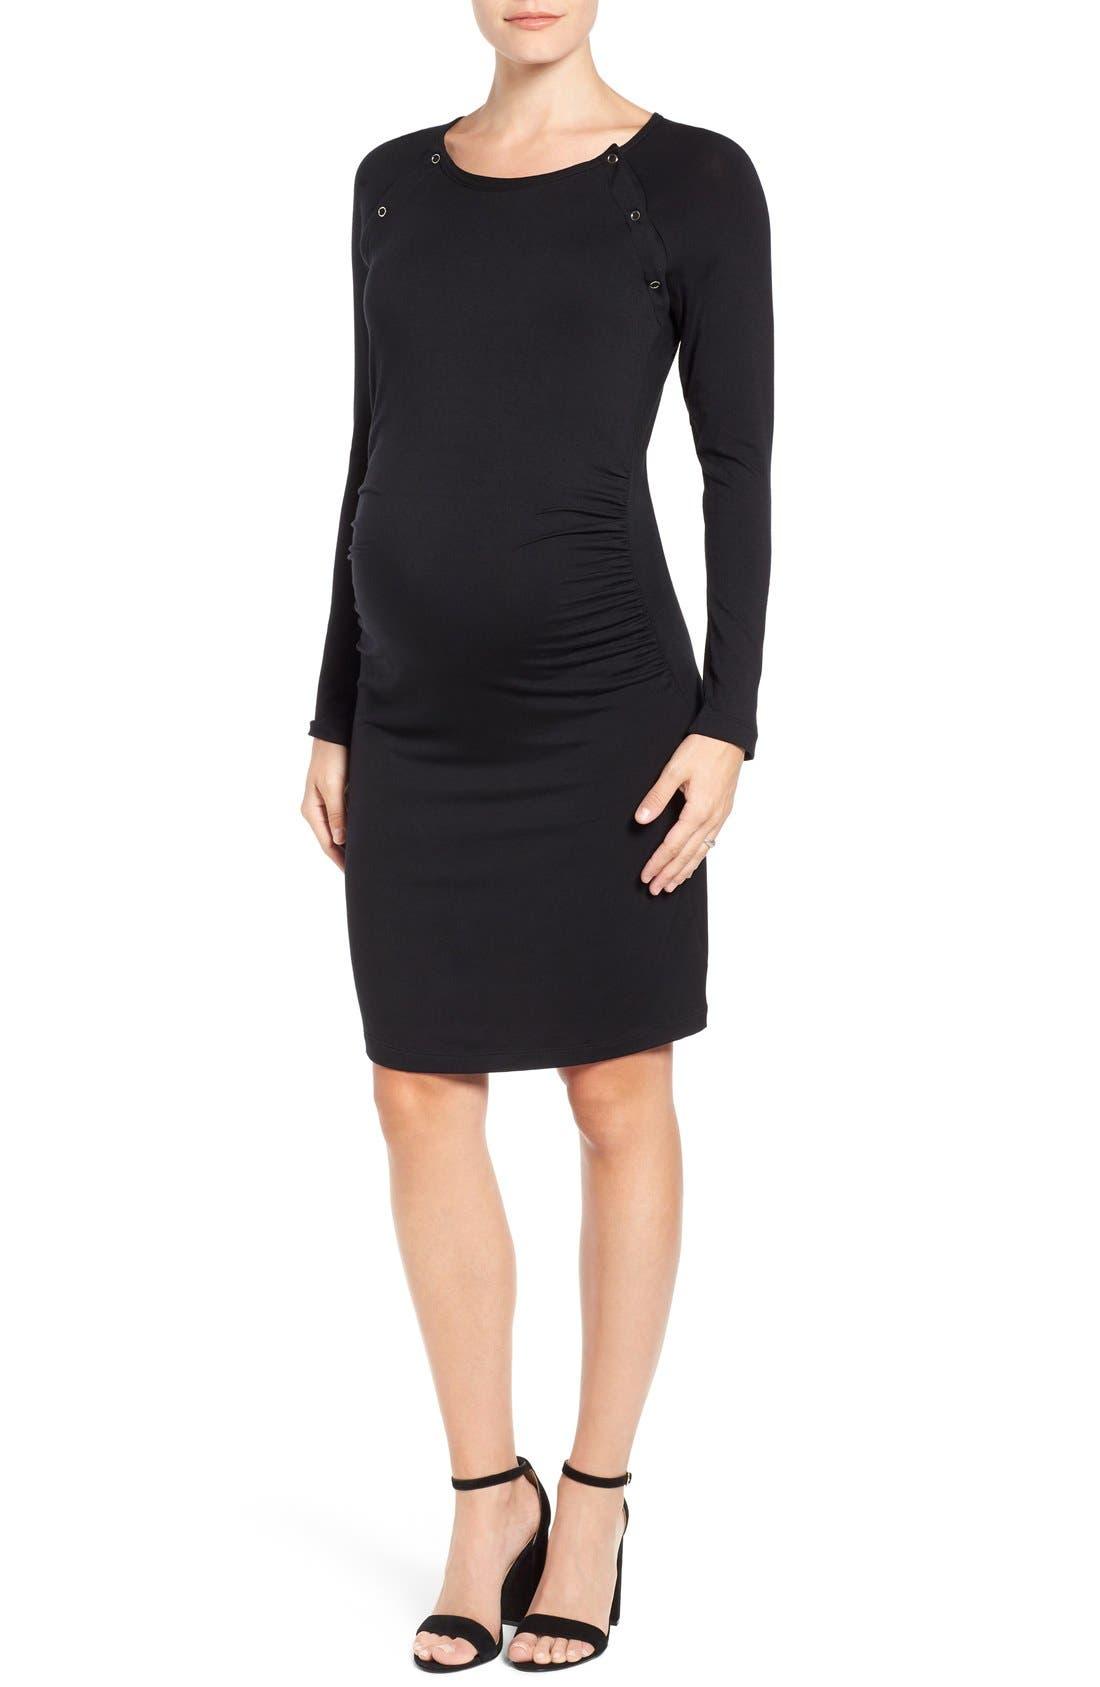 LAB40 'Alex' Ruched Maternity/Nursing Dress